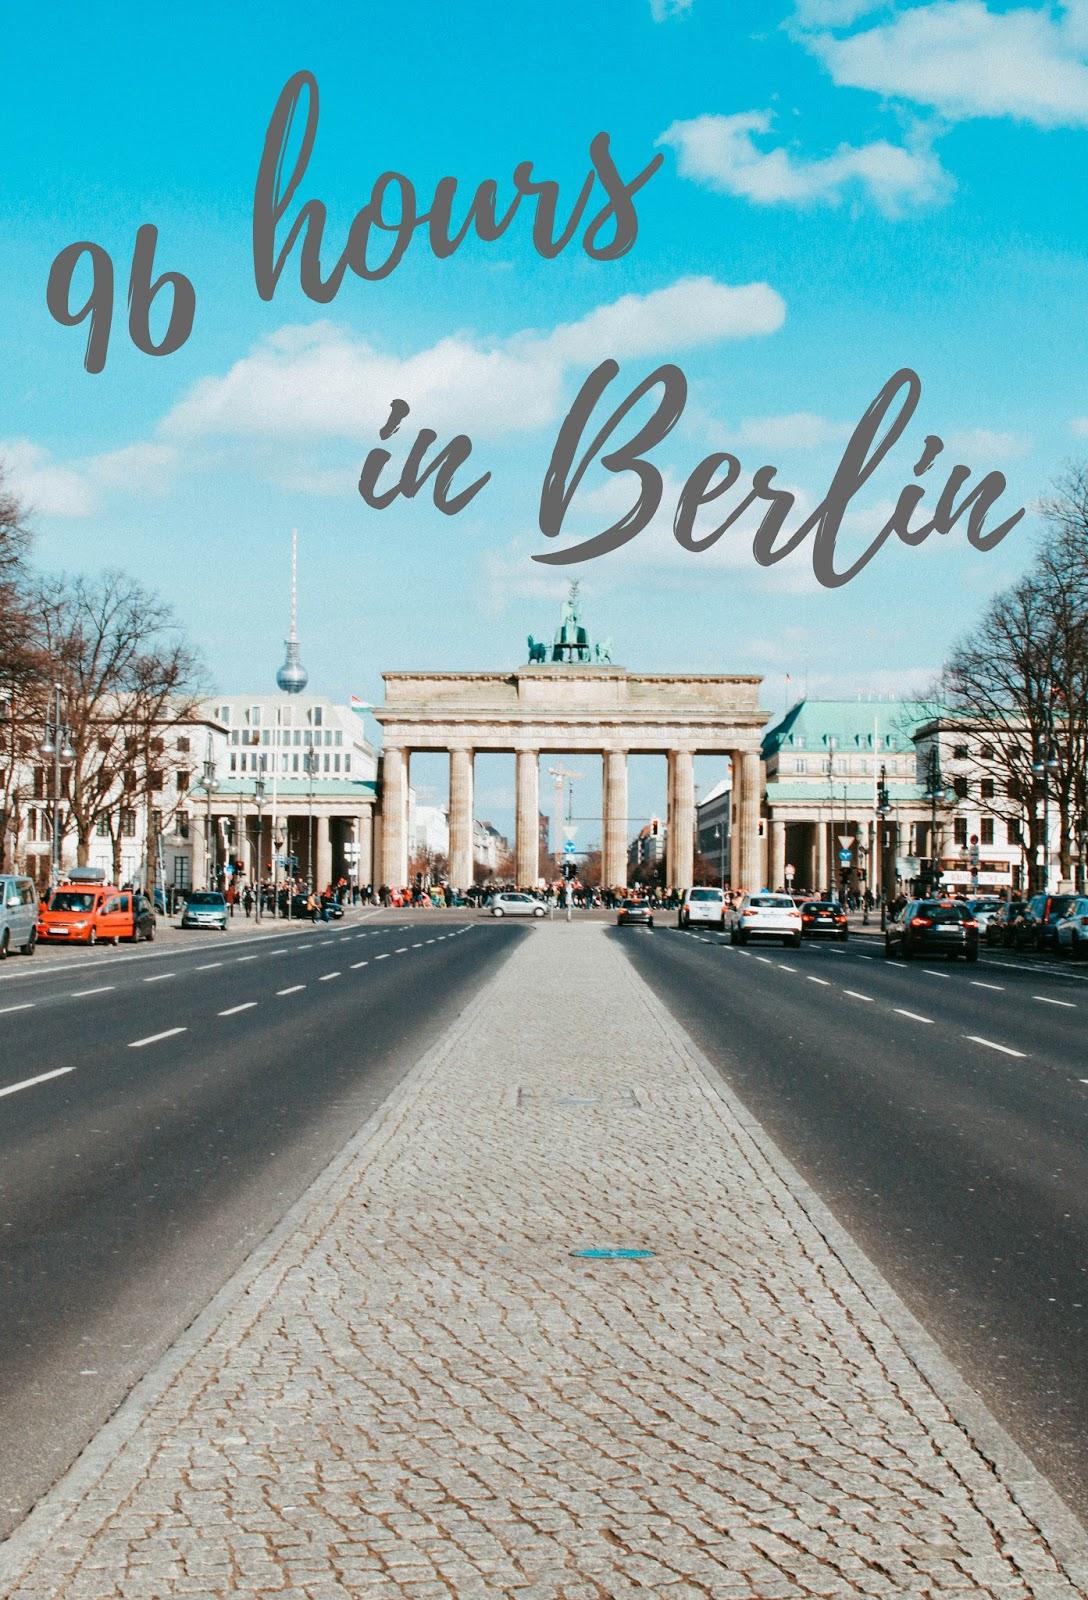 96 hours in berlin, berlin, berlin germany, berlin travel, travel blogger, travel diary, europe travel, europian trip, getaway, weekend trip, weekend break, lifestyle, lifestyle blogger, fashion blogger, beauty blogger, forever september